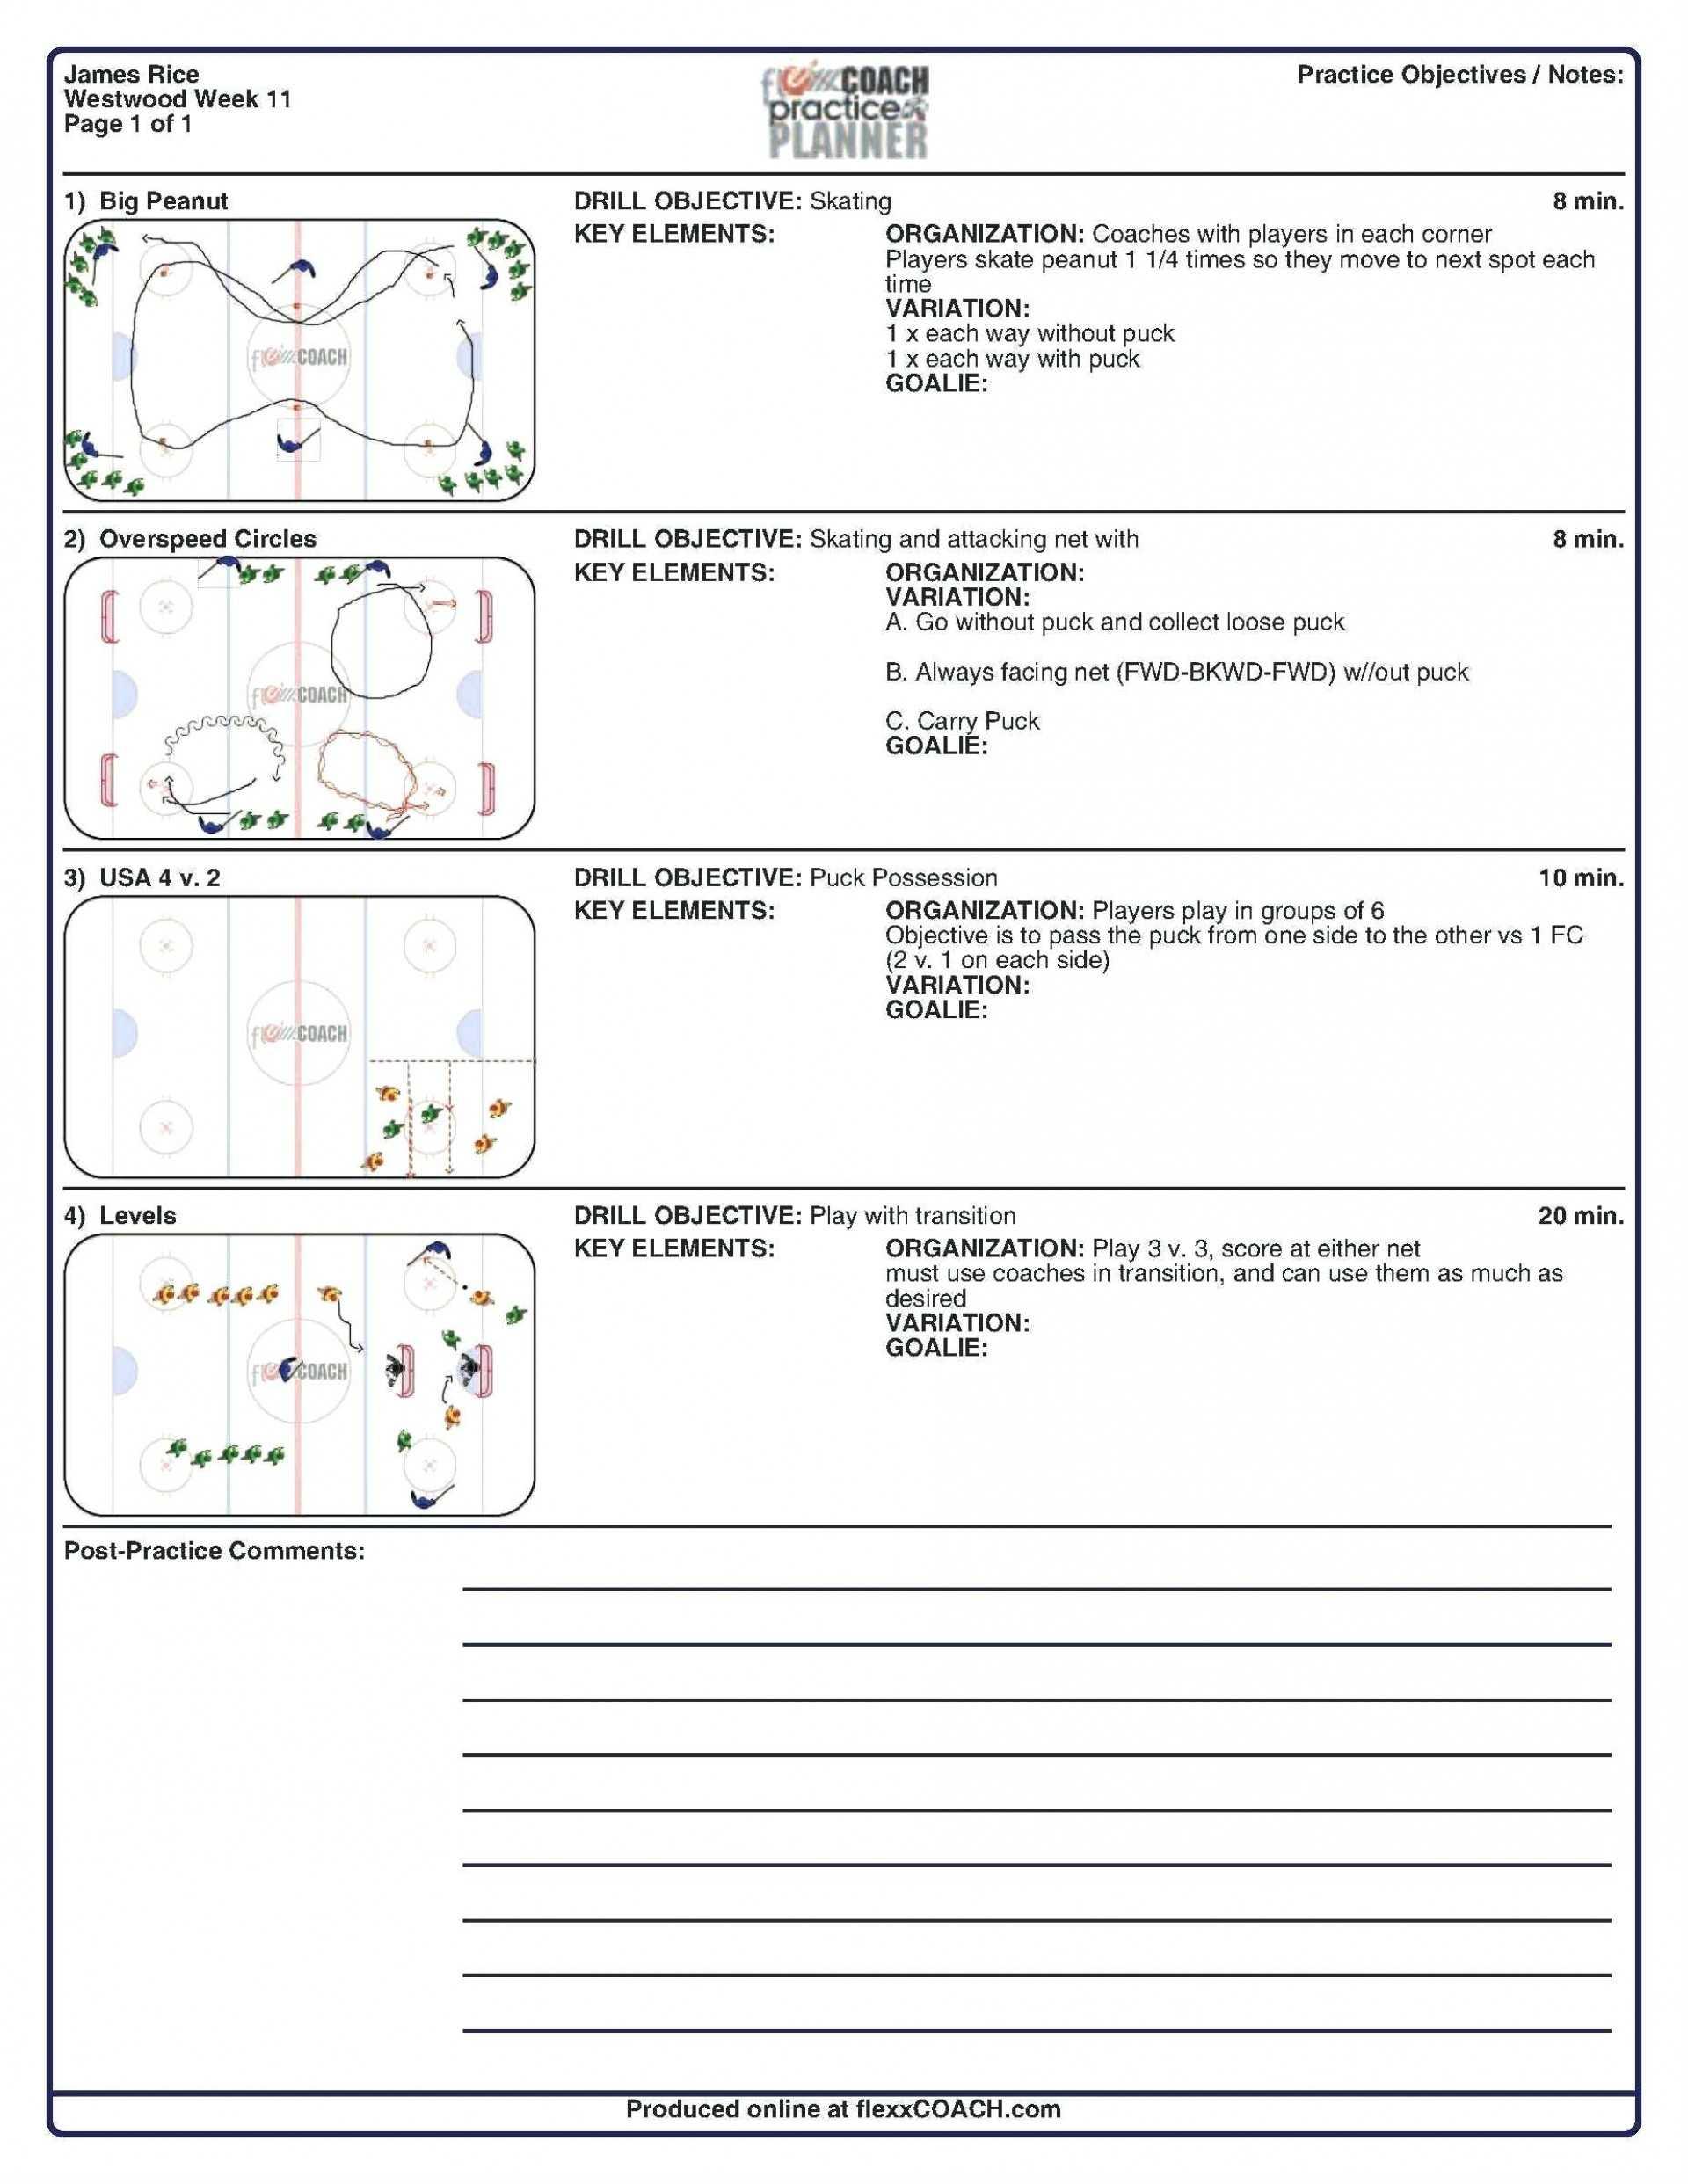 010 Basketball Practice Plan Template 4Amwotmo Ideas With Regard To Blank Hockey Practice Plan Template